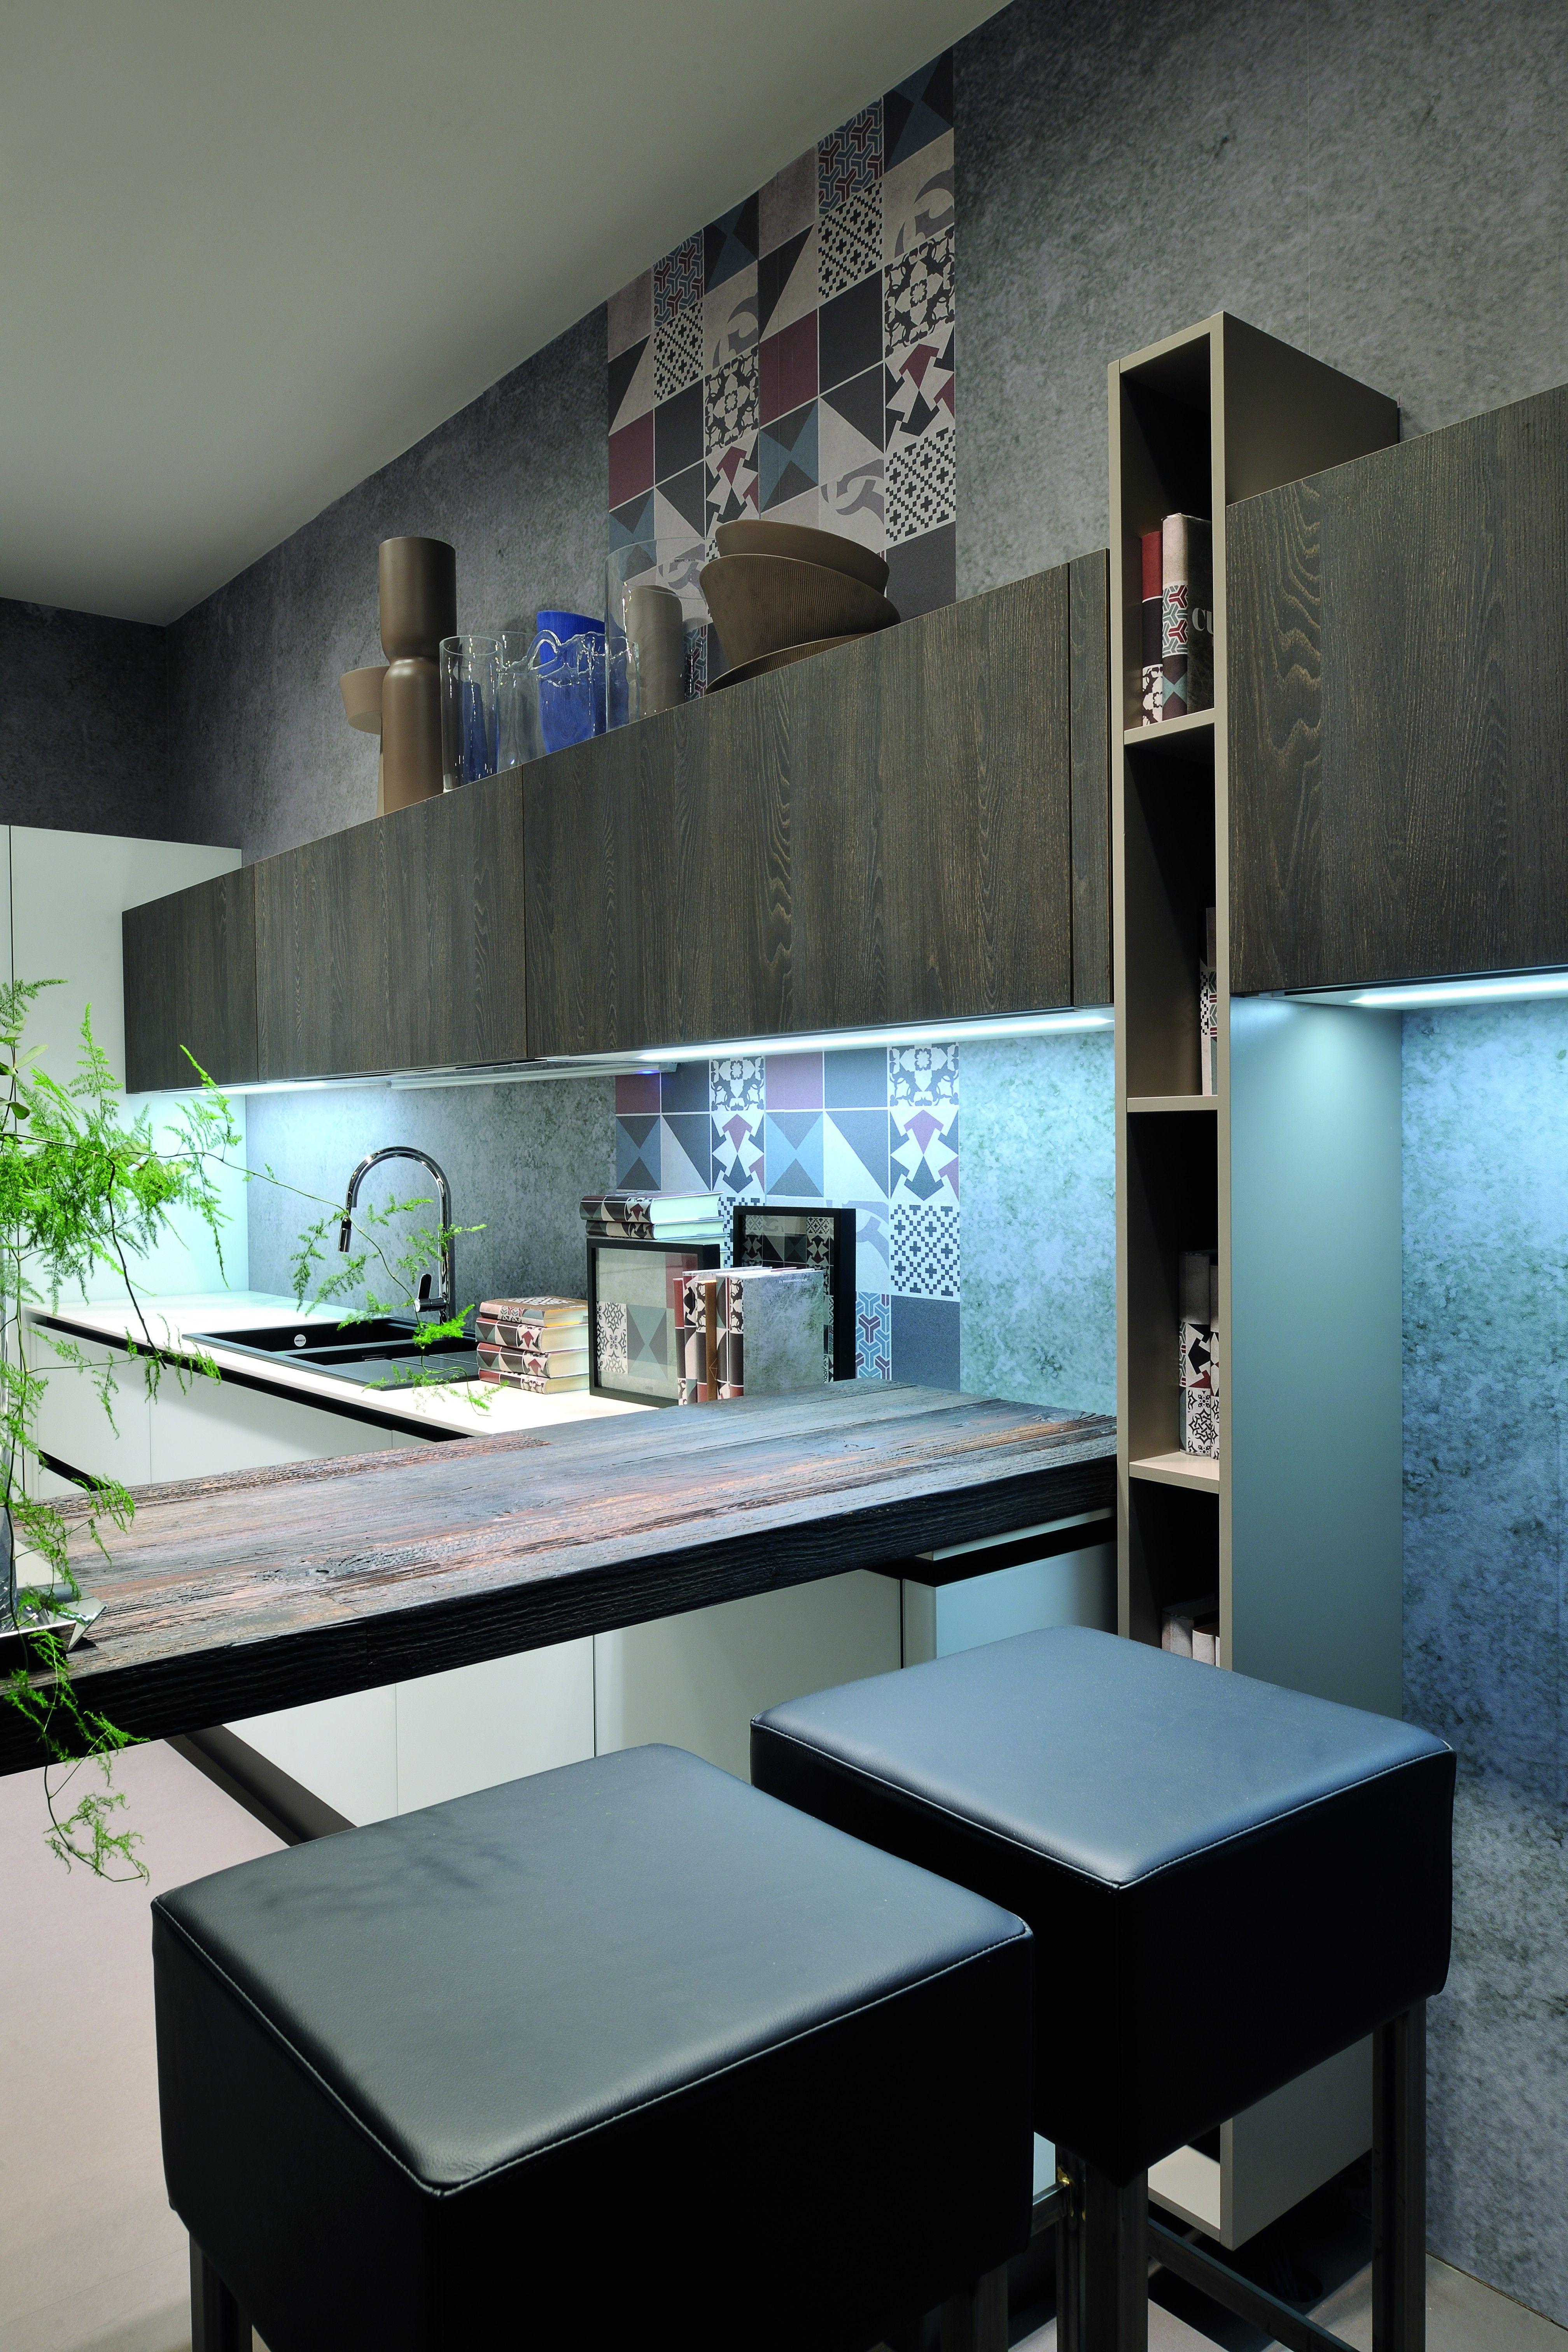 Bijou Design style Cucine, Interni, Arredamento